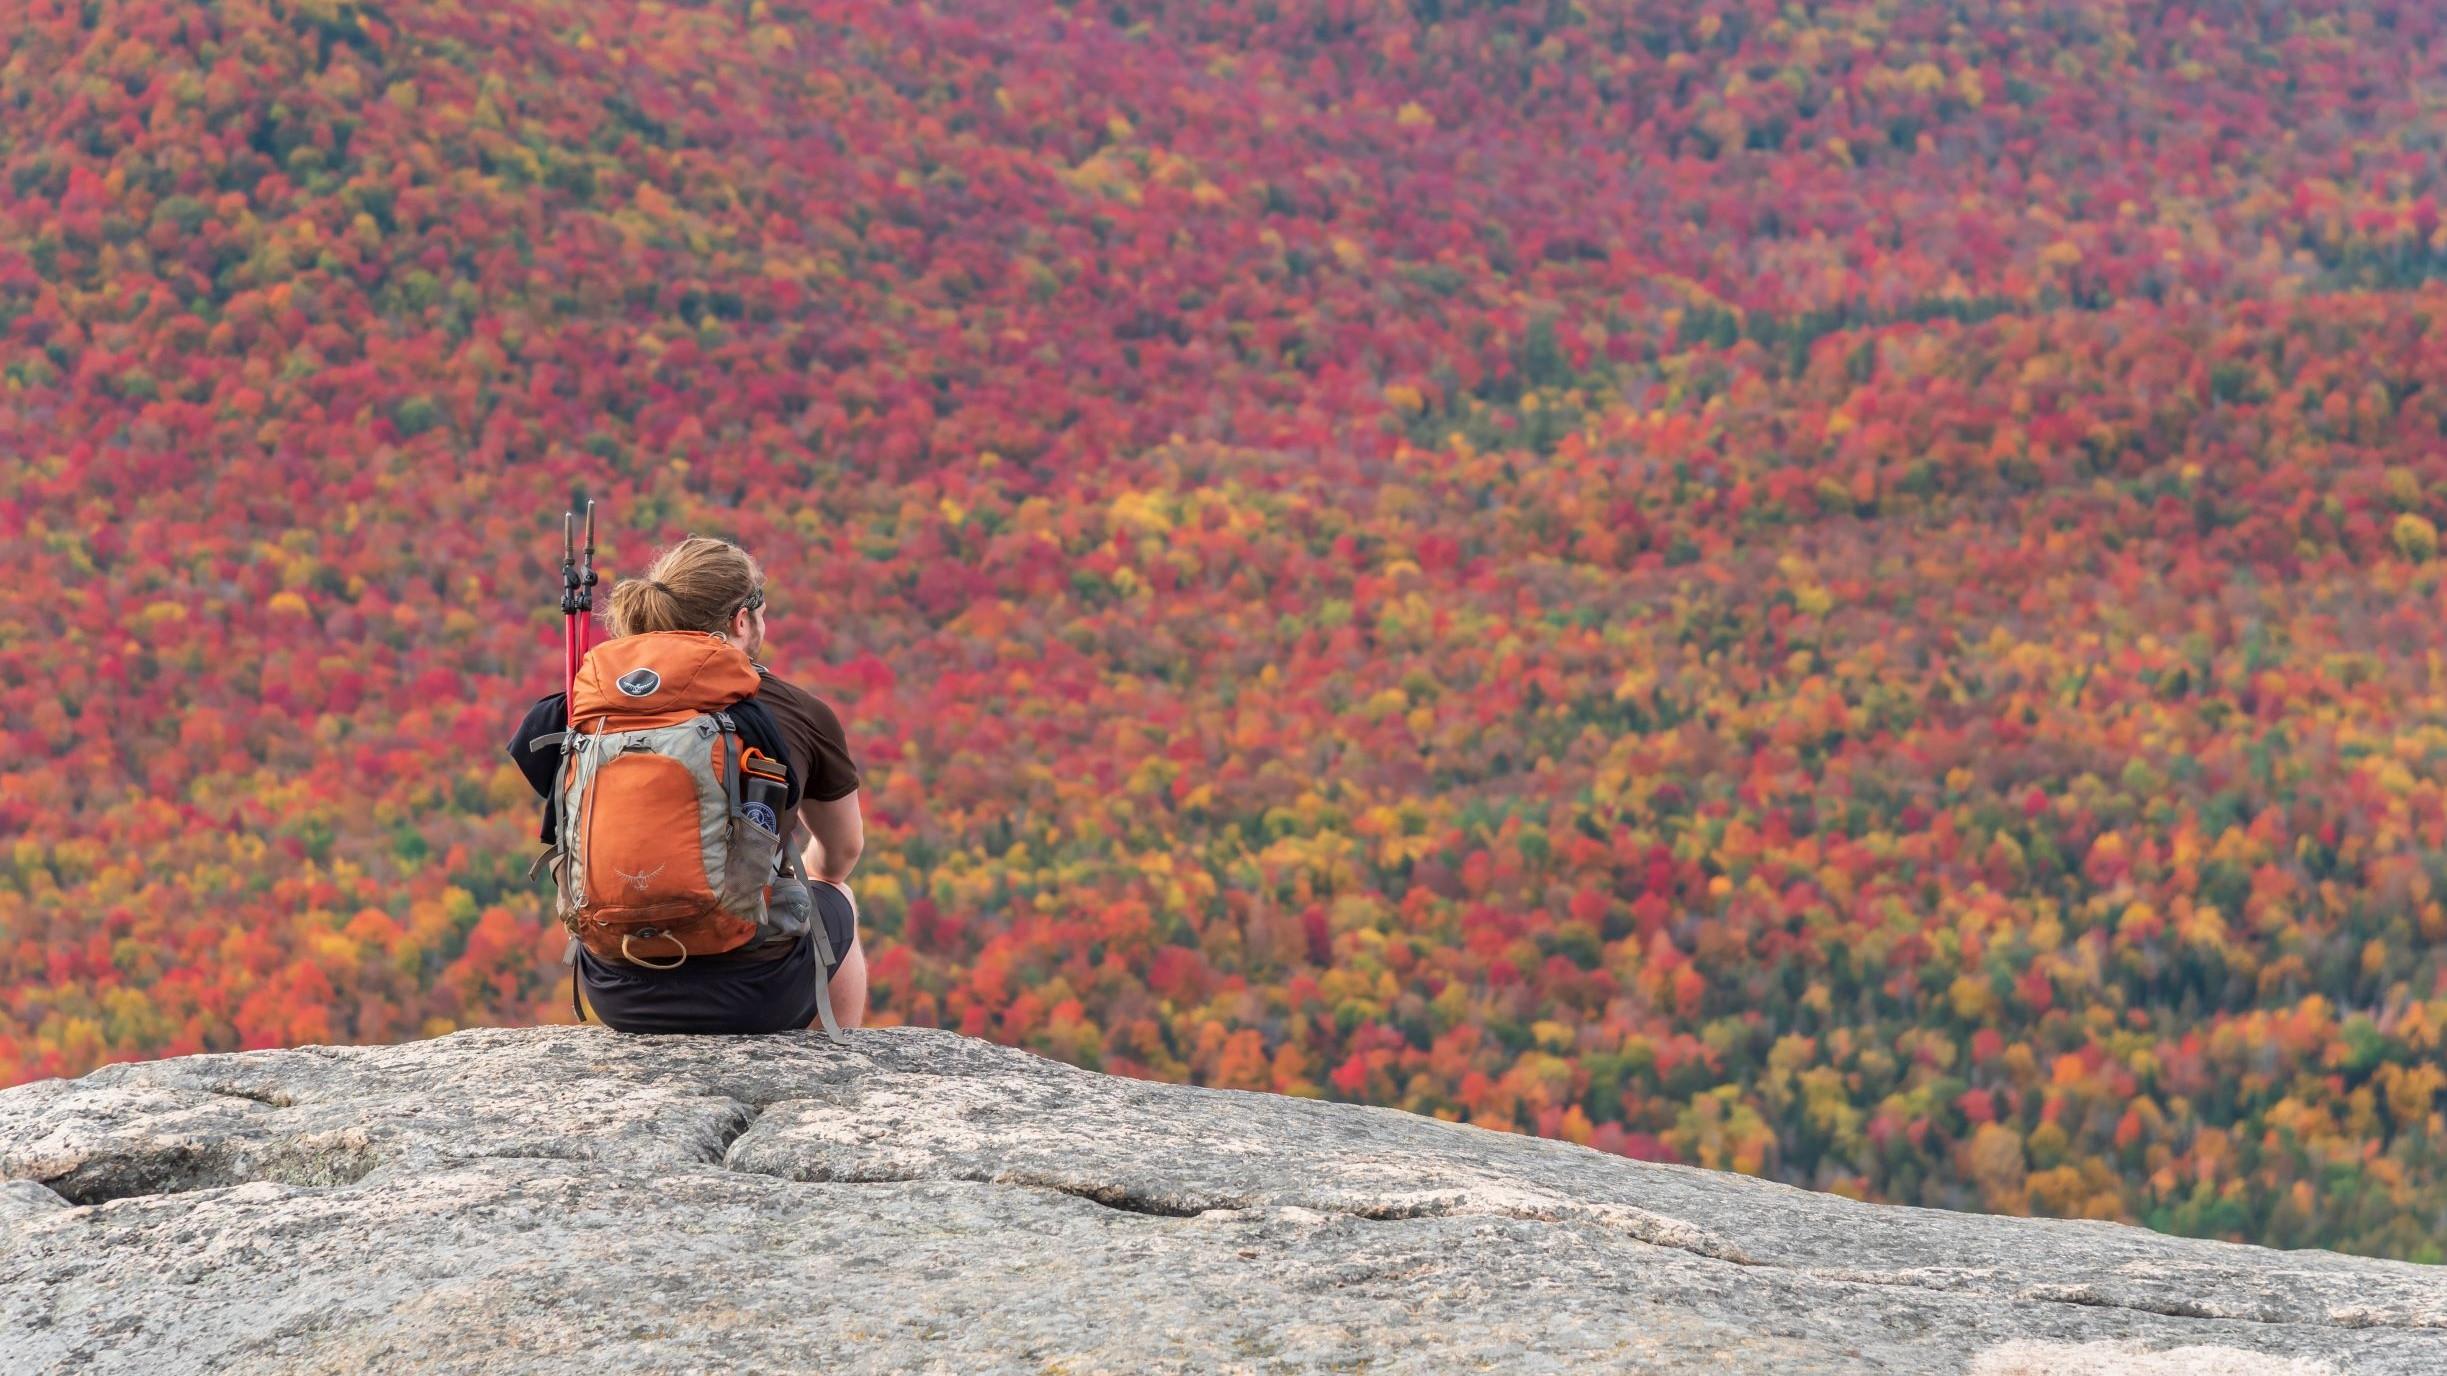 A man sits on a summit